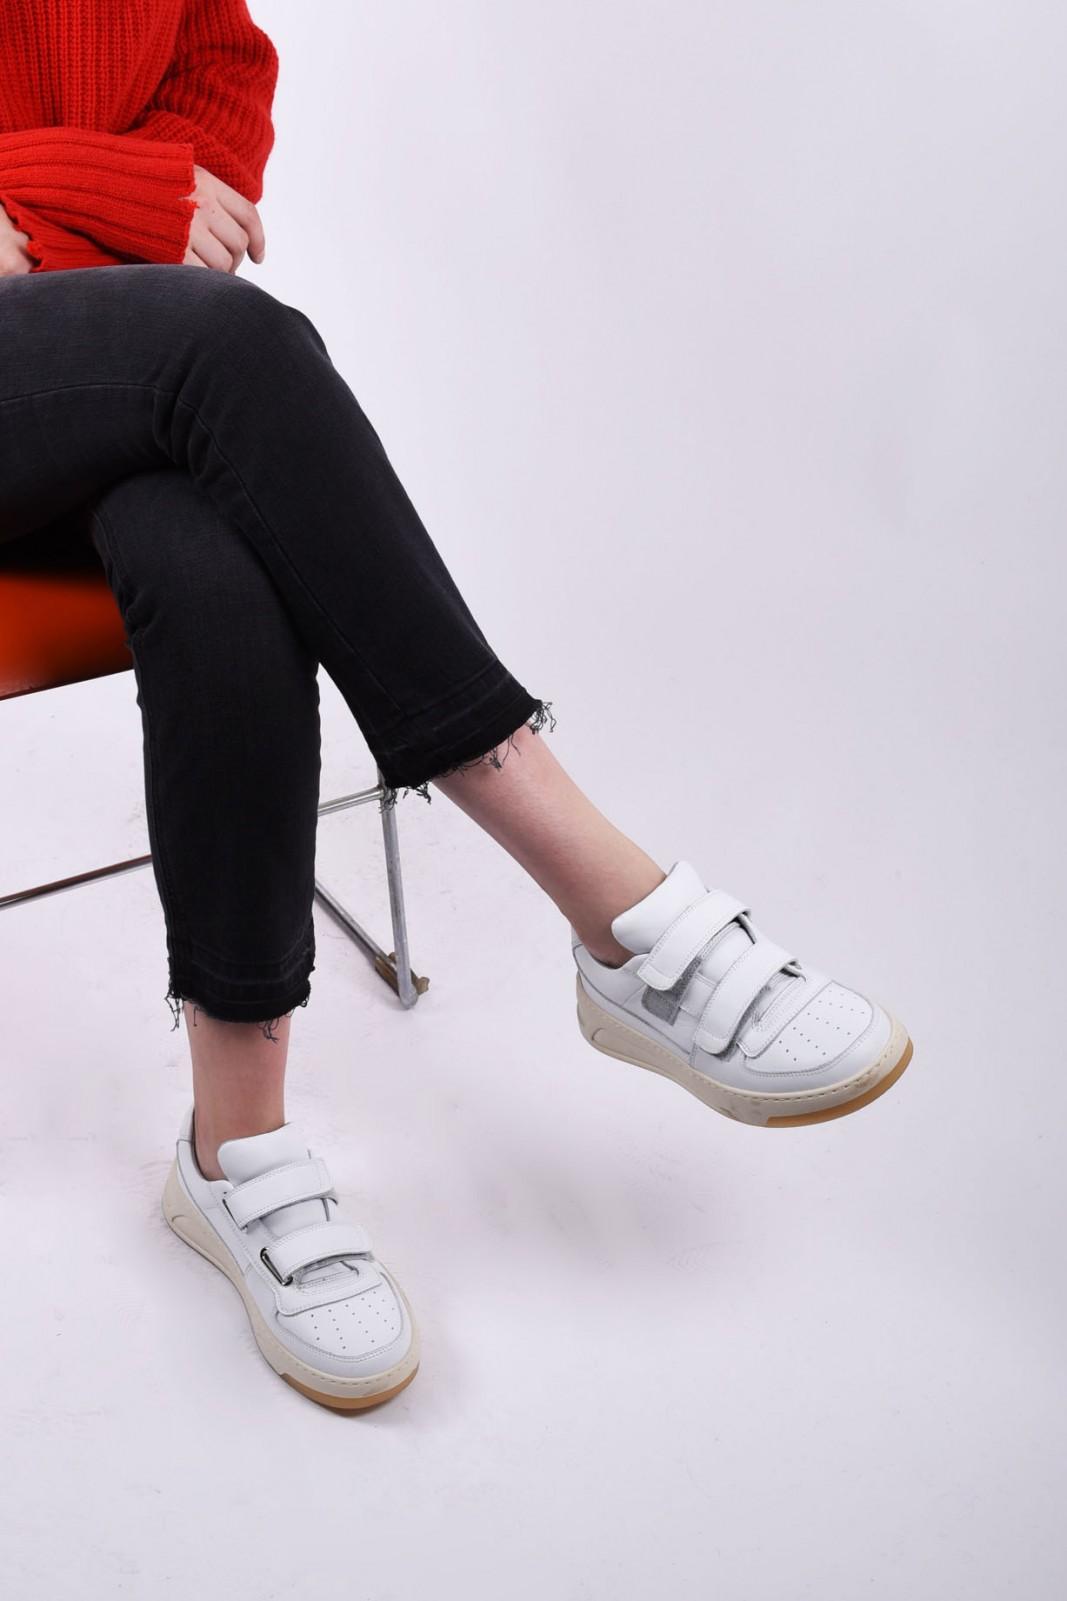 ACNE STUDIOS velcro sneakers white, please contact us